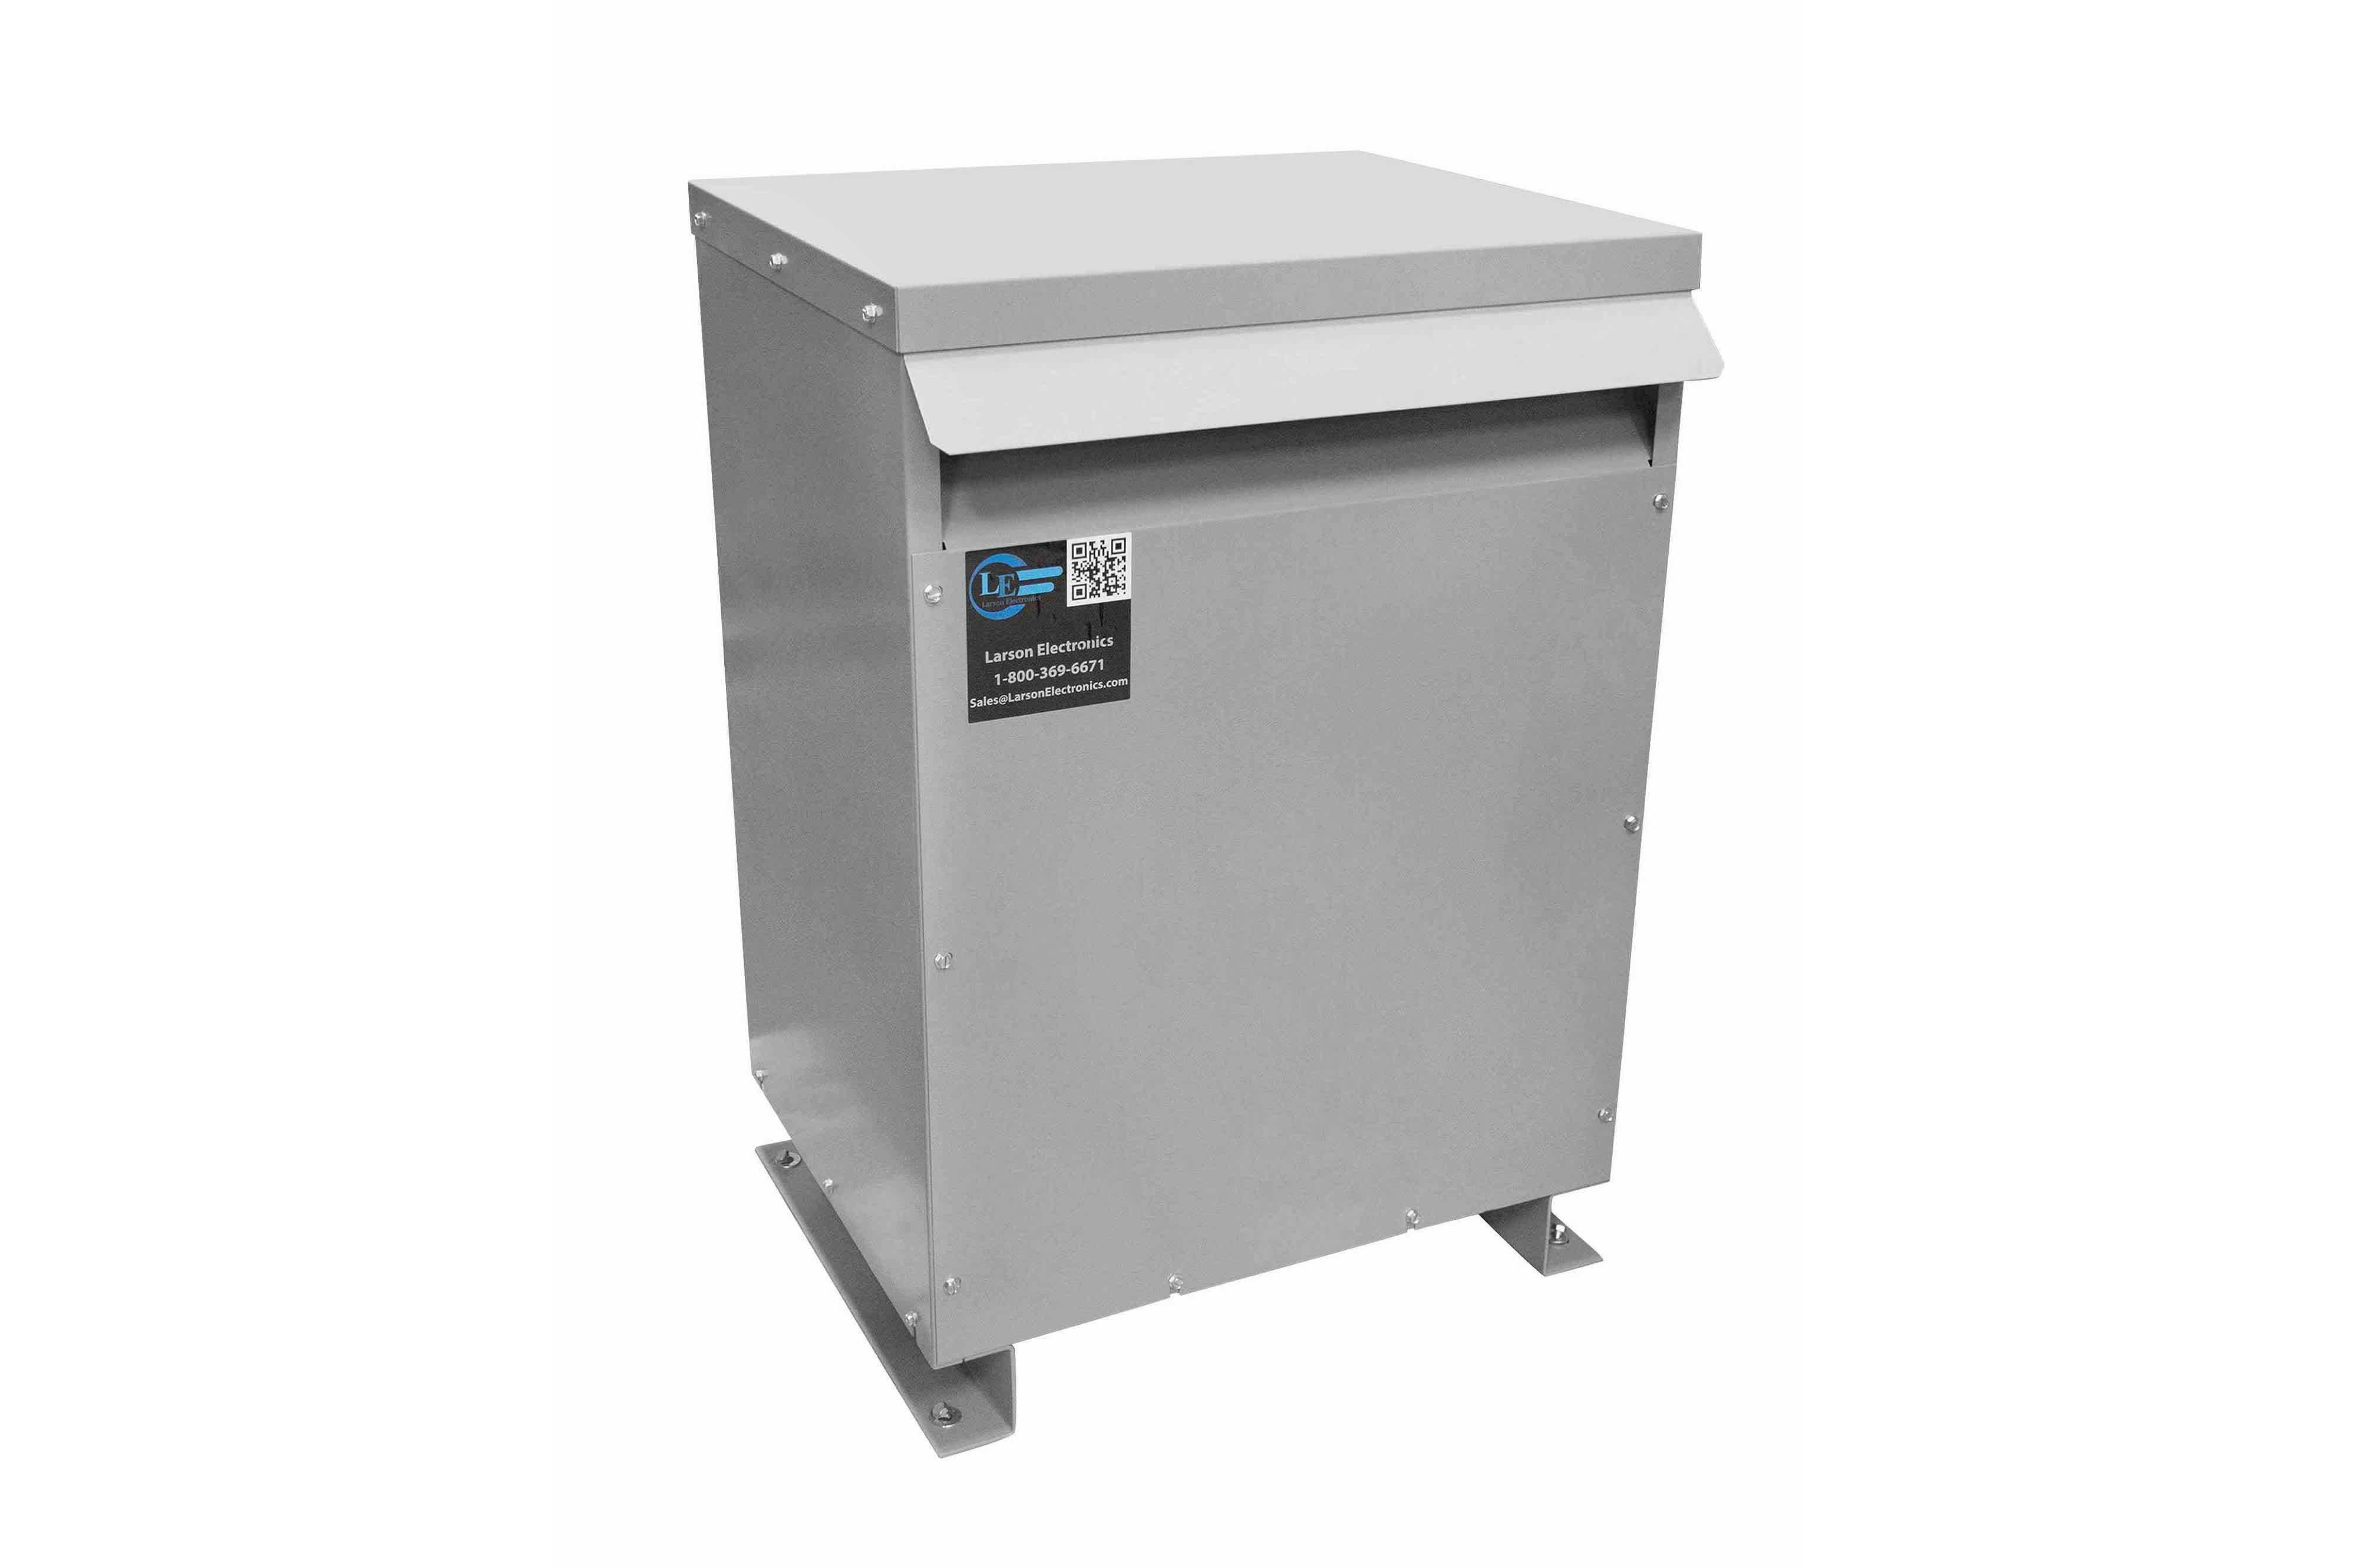 45 kVA 3PH Isolation Transformer, 230V Wye Primary, 480Y/277 Wye-N Secondary, N3R, Ventilated, 60 Hz